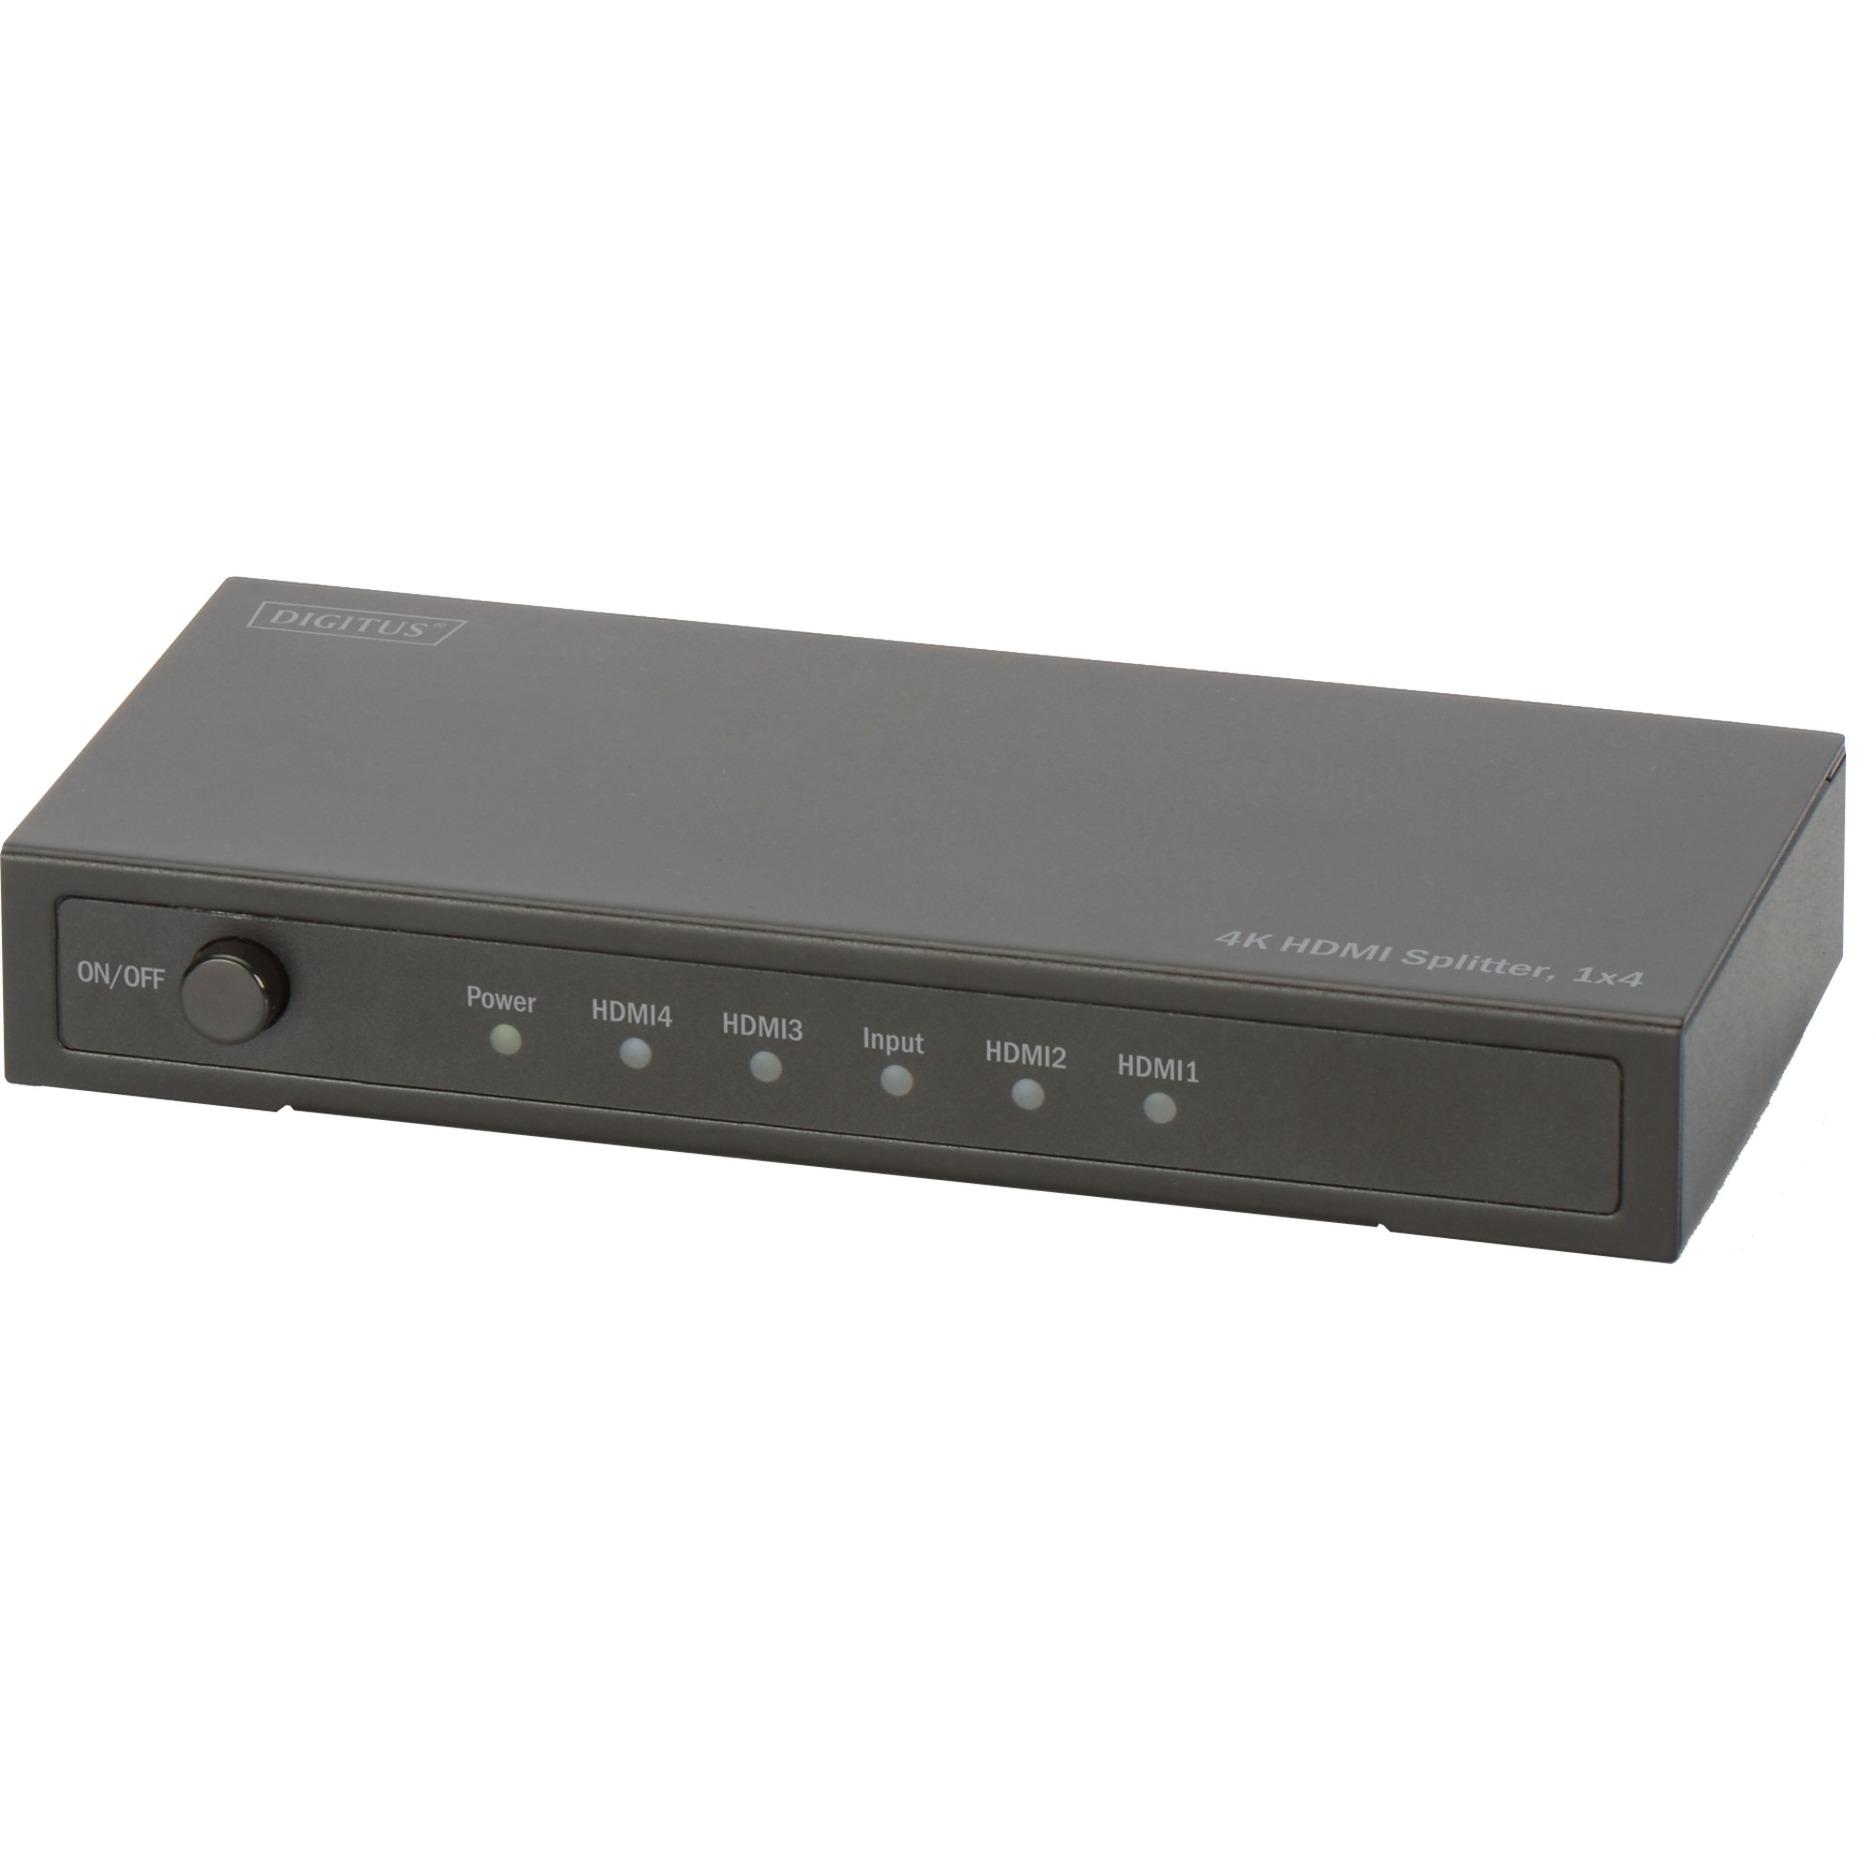 DS-47304 HDMI divisor de video, Divisores & Conmutadores